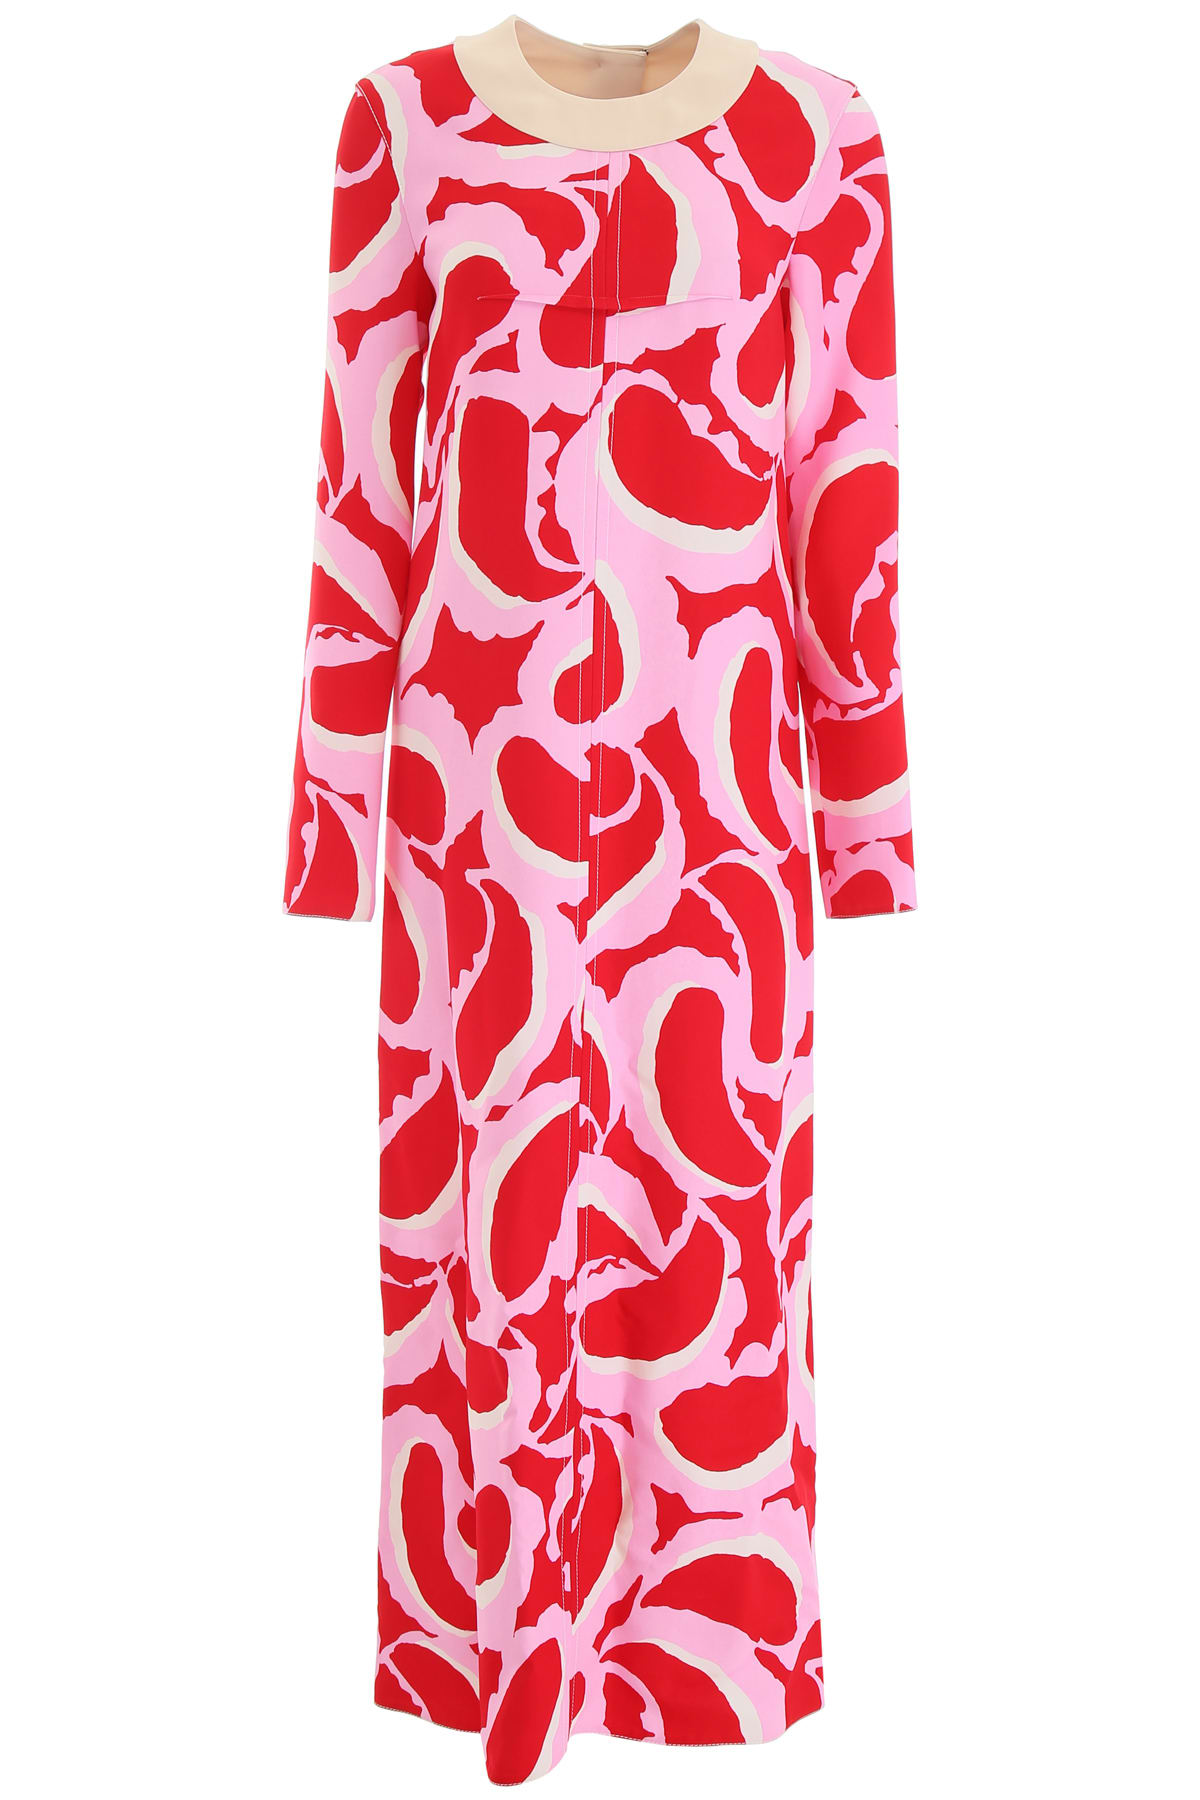 Marni Teardrop Dress